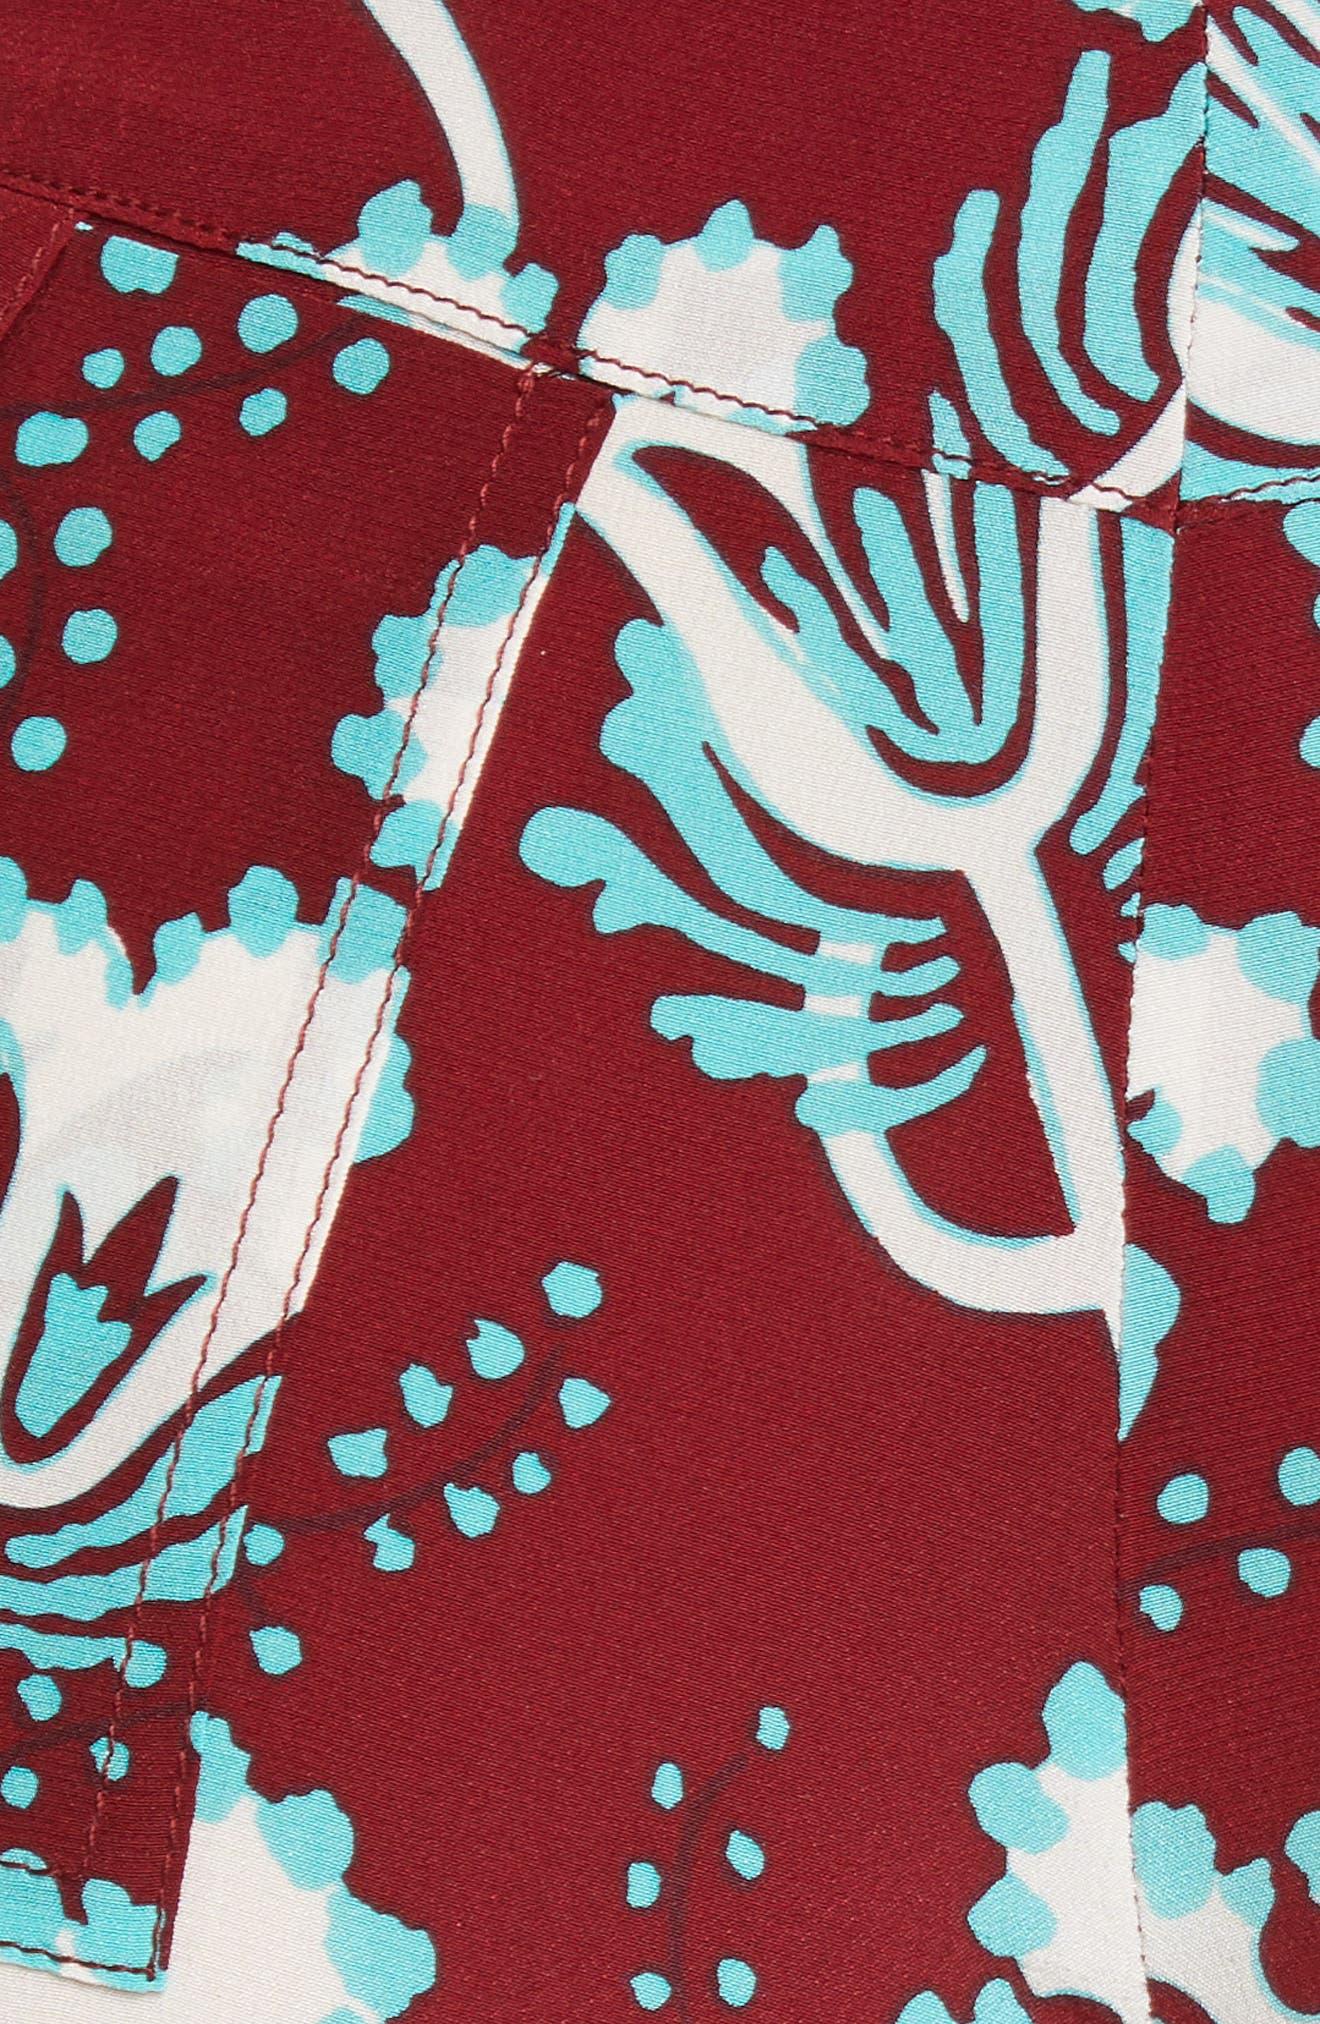 VALENTINO, Elderflower Print Wide Leg Silk Pants, Alternate thumbnail 5, color, GTB-GARNET/TURCHESE/BIANCO